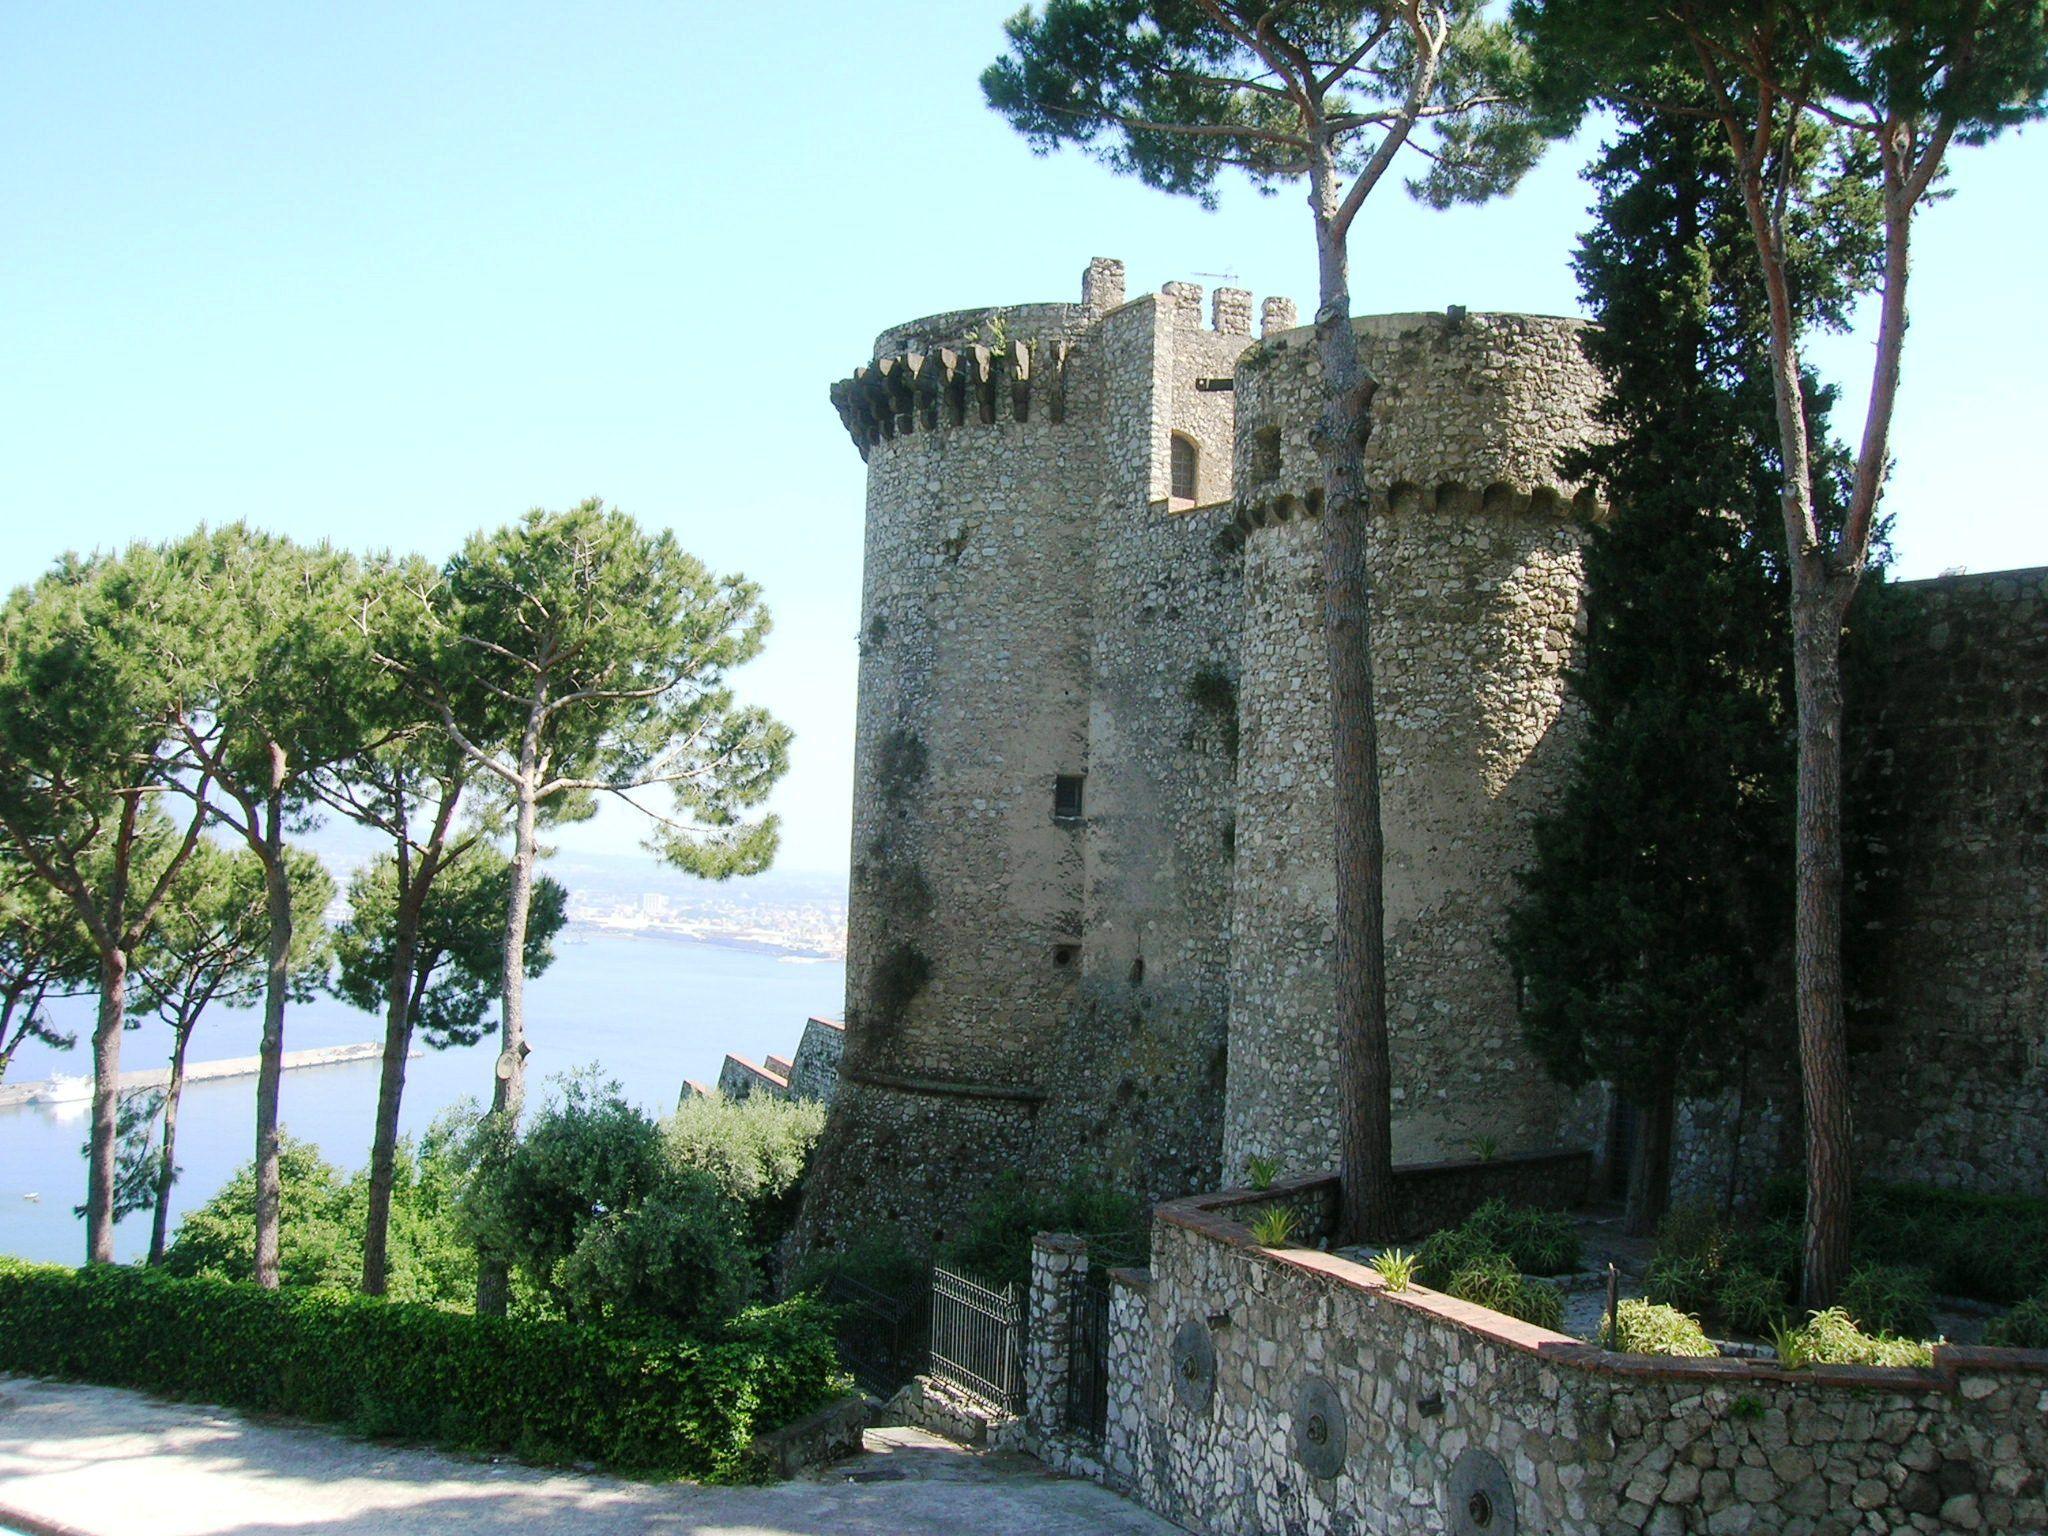 Medioevale Castle, Castellammare, Campania, Italy